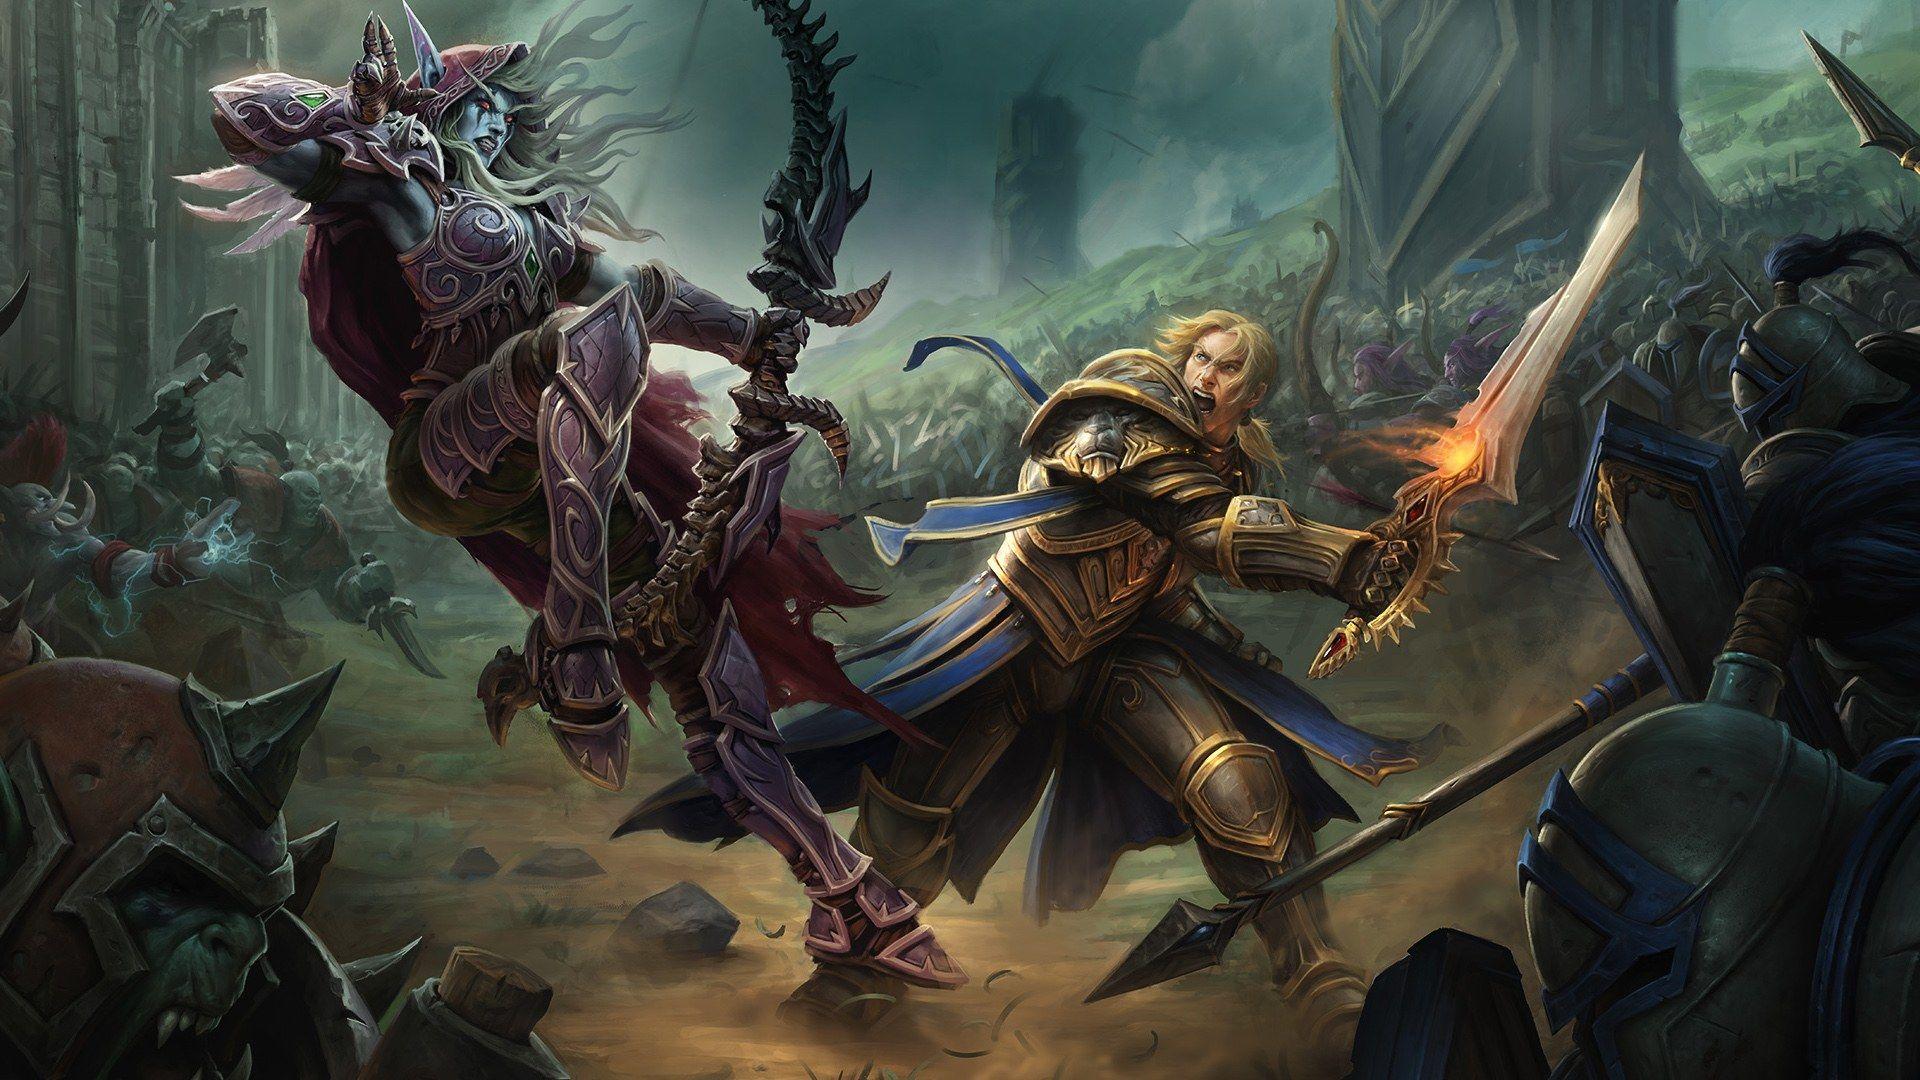 Horde Wallpaper Battle For Azeroth Labzada